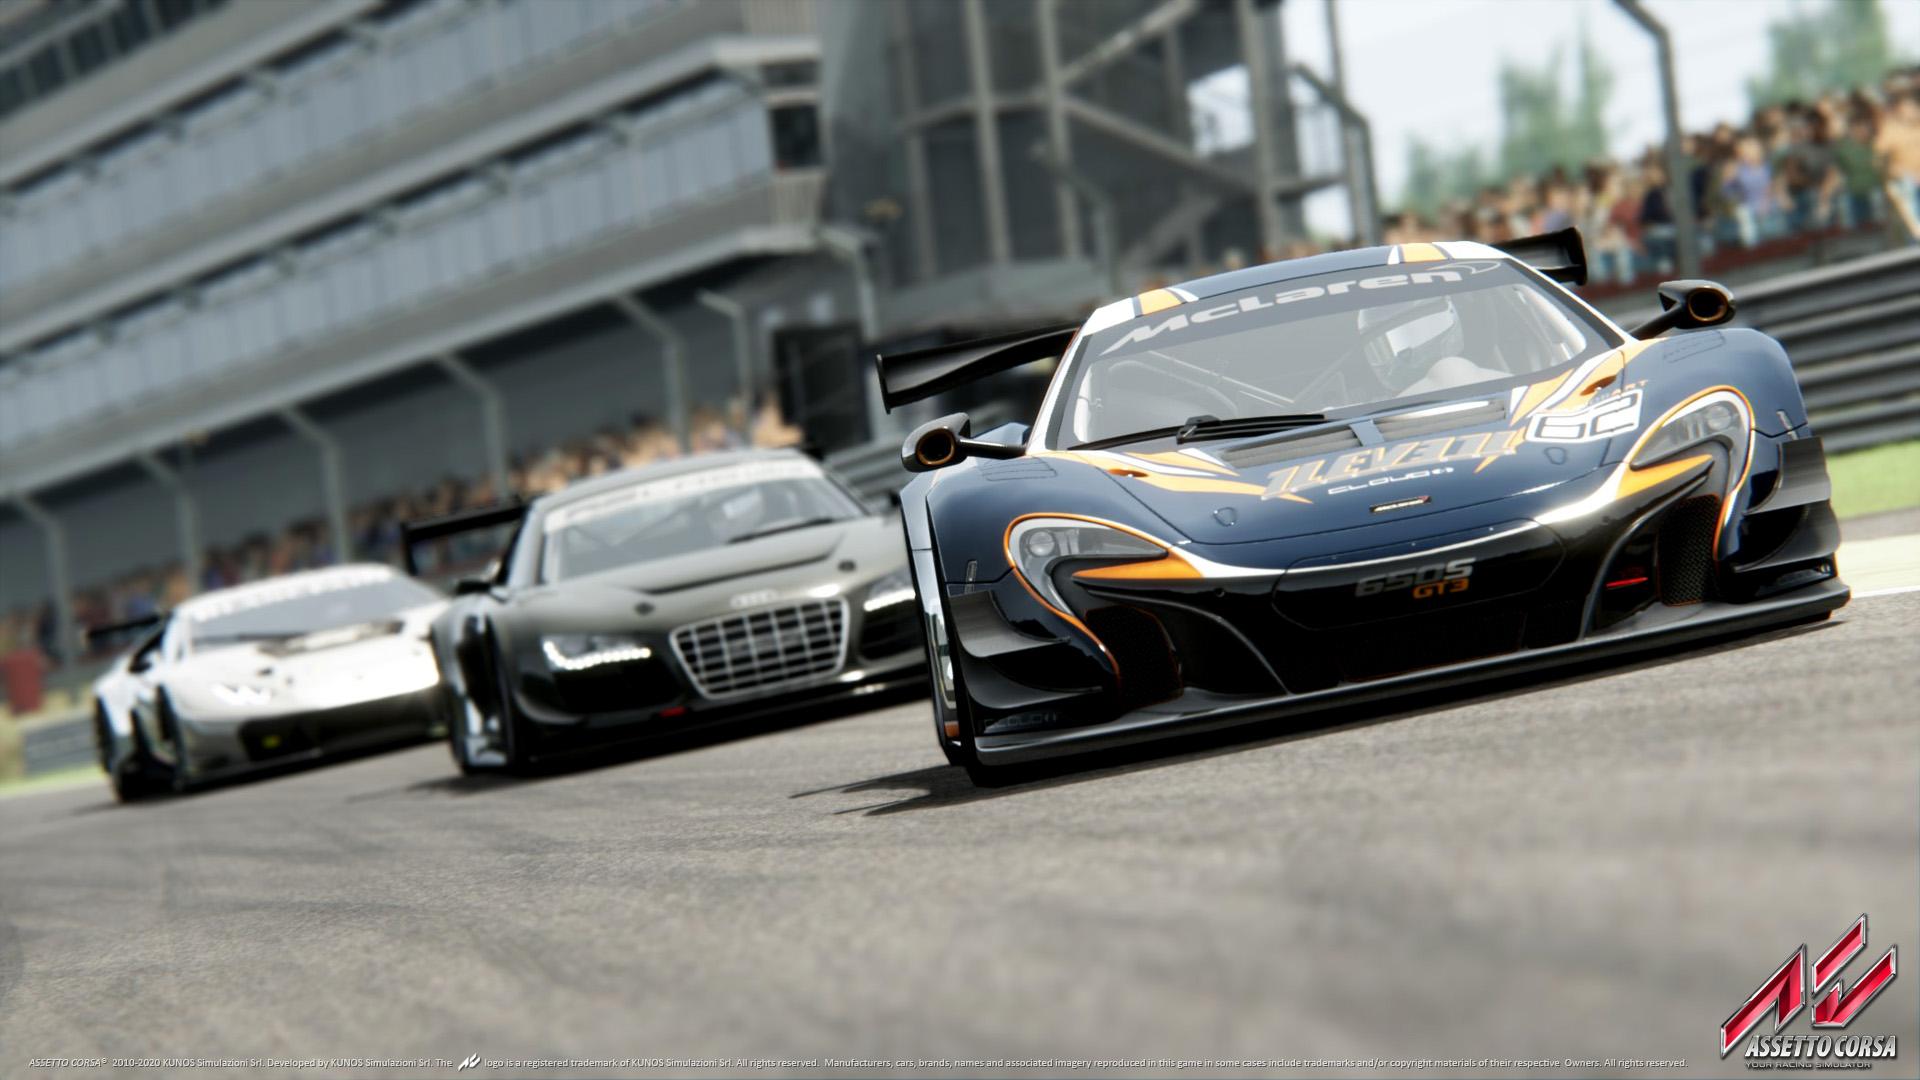 Assetto Corsa console screenshot, Audi R8, McLaren P1